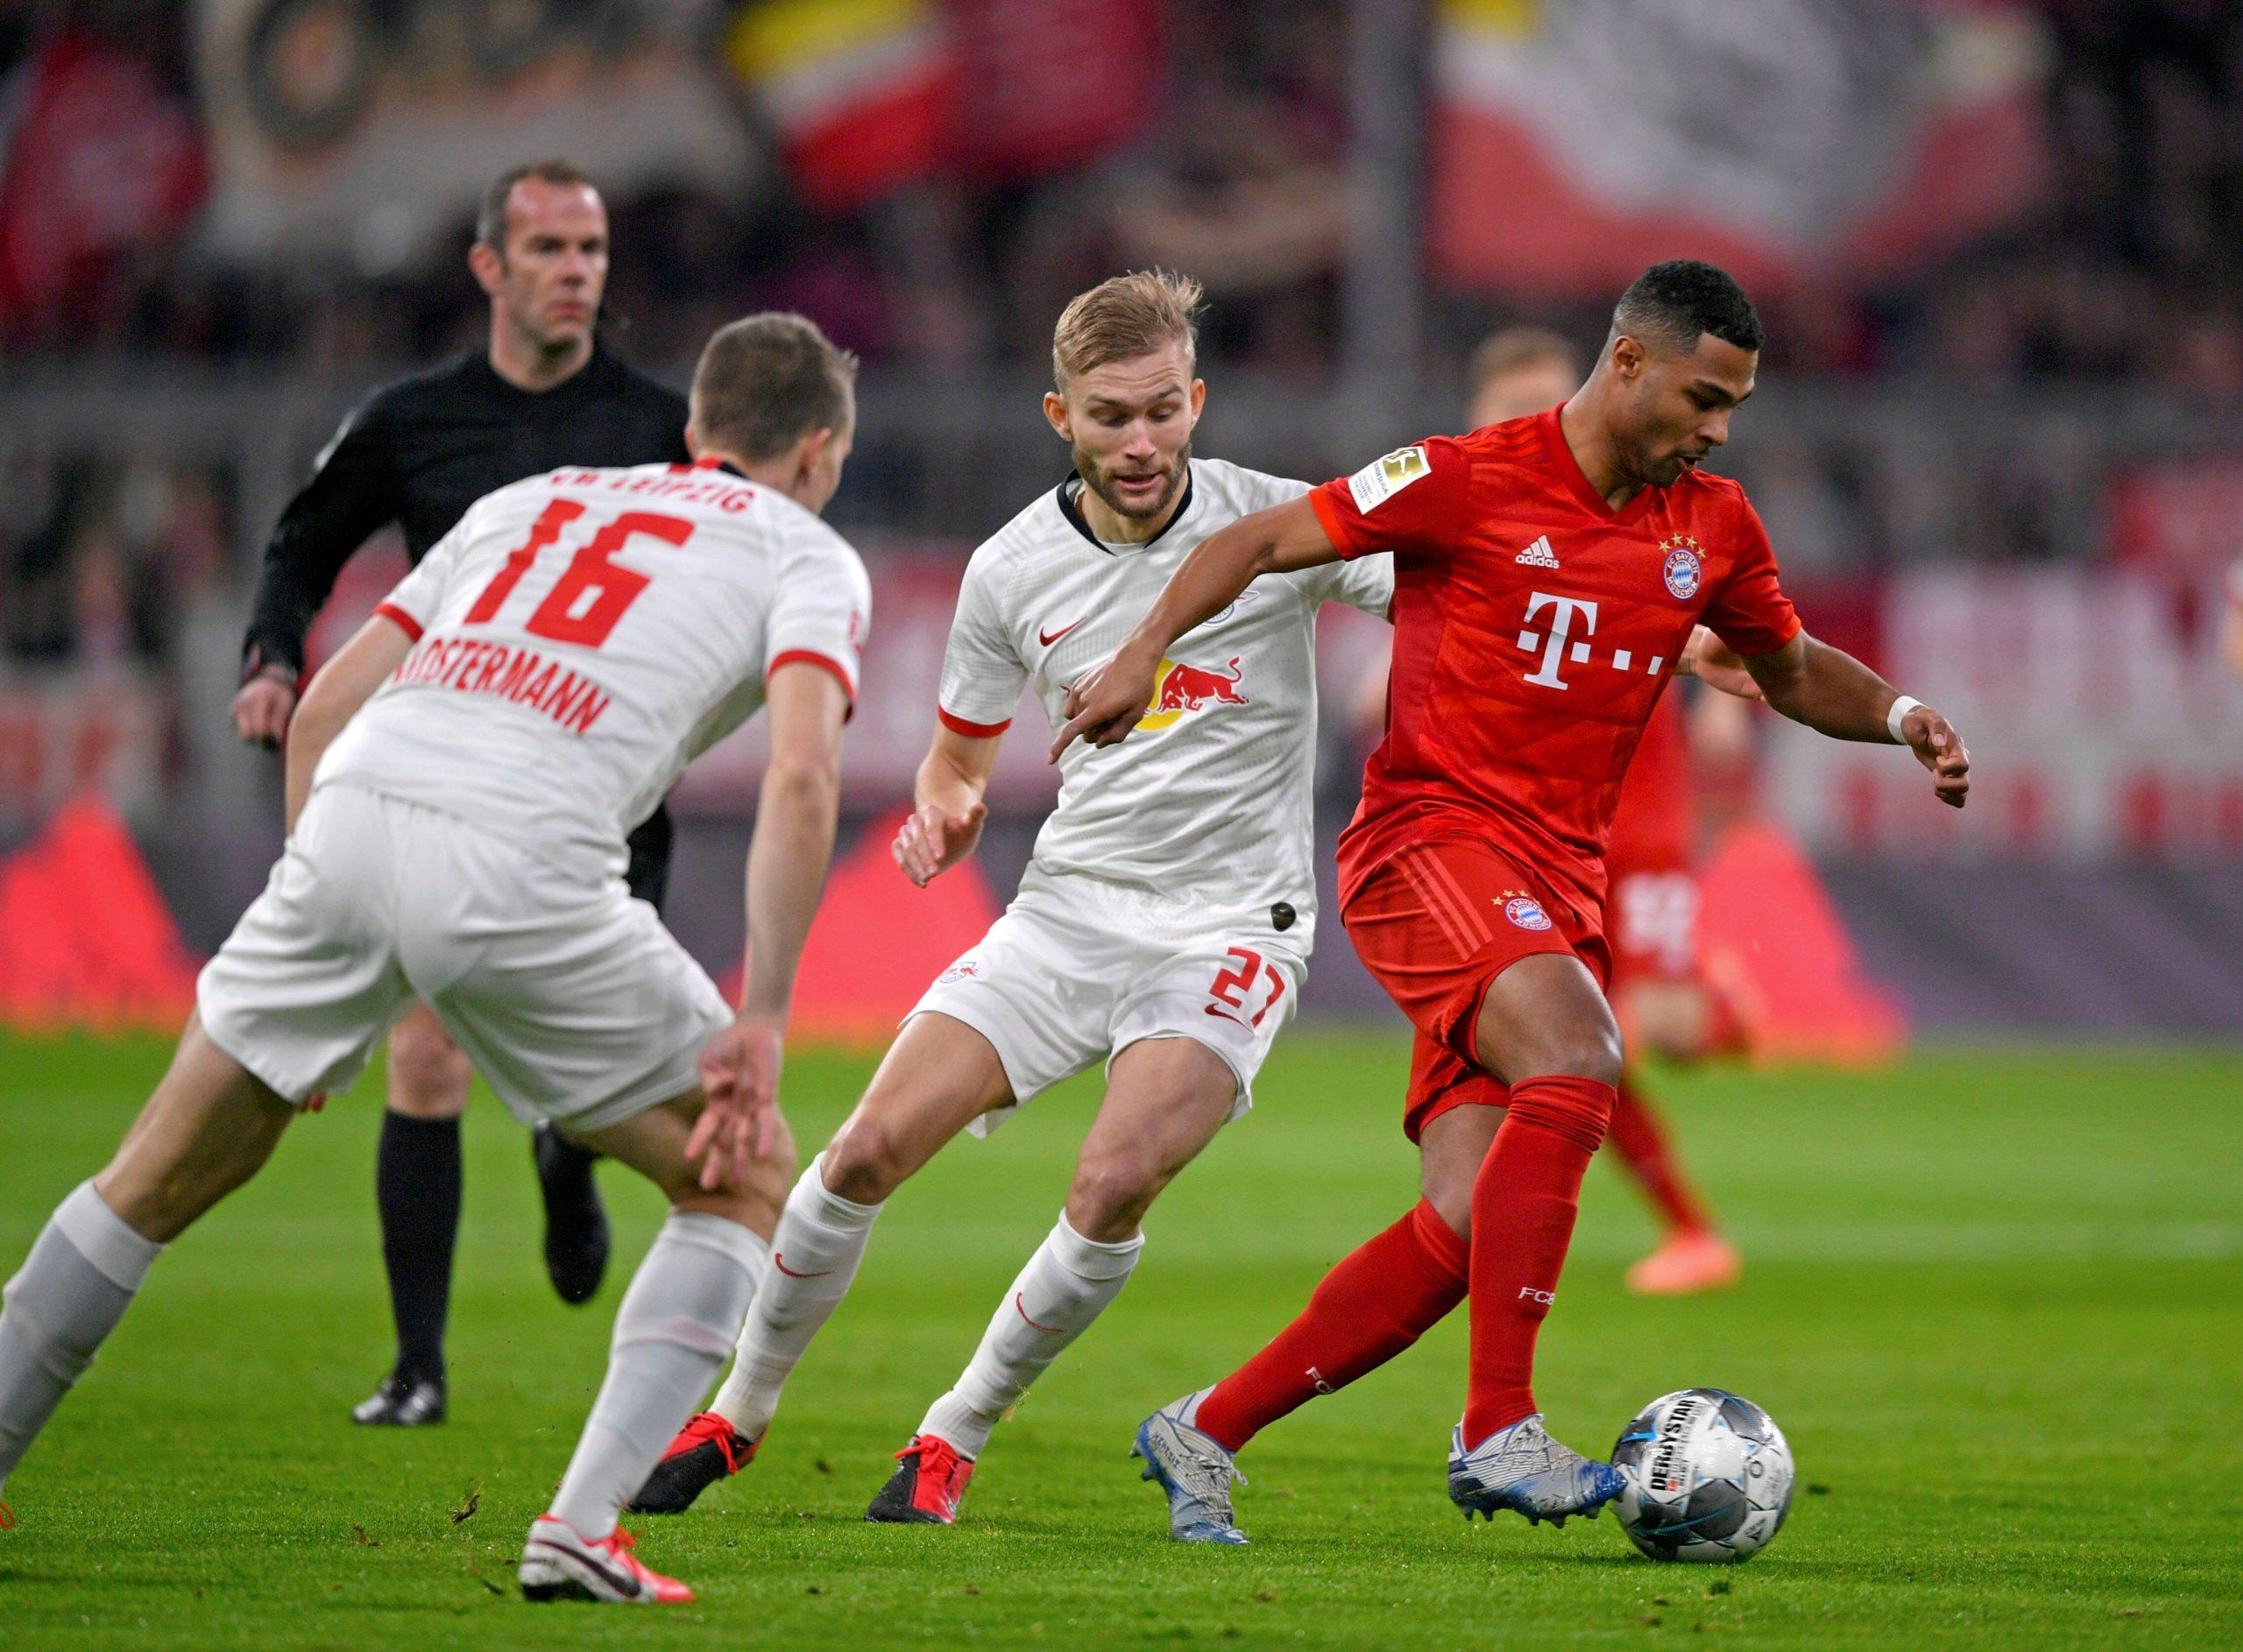 Soi kèo Leipzig vs Bayern, 23h30 ngày 03/04 – Bundesliga